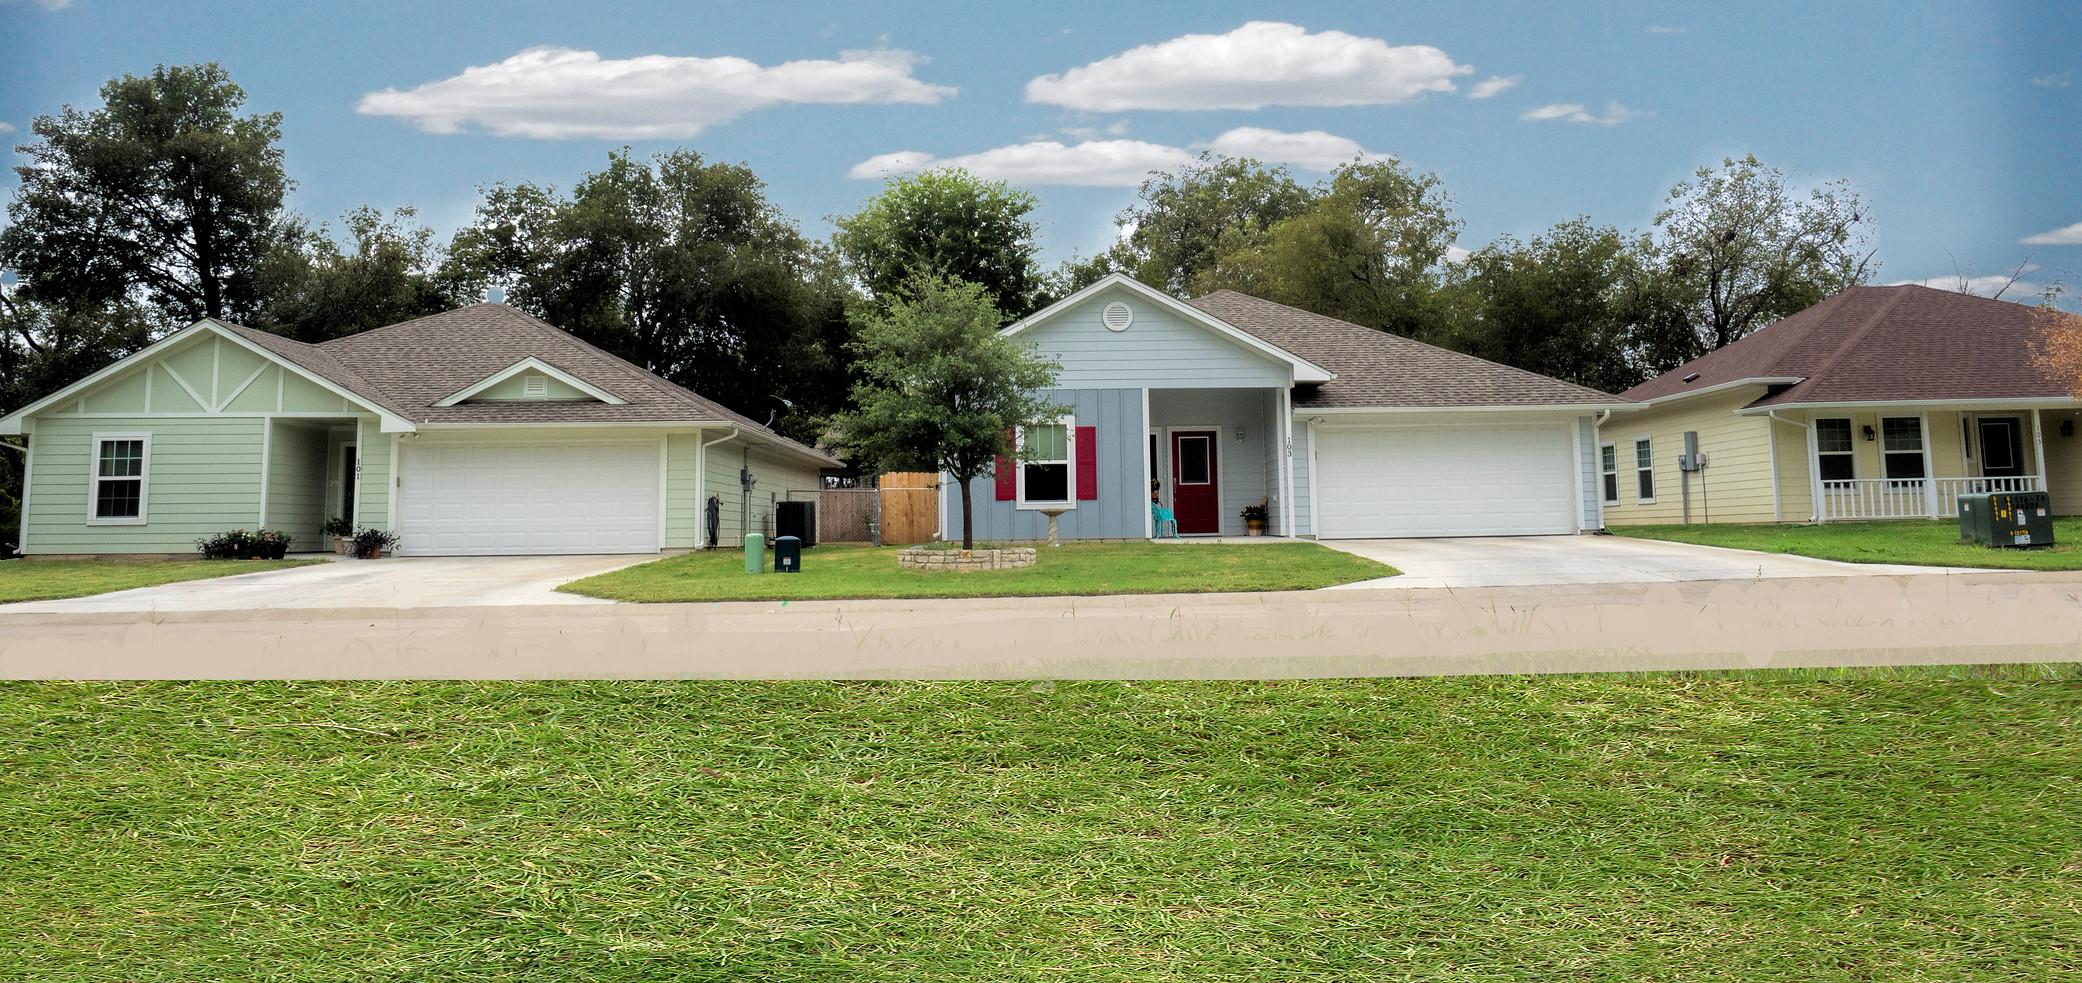 Bluebird Park Energy Star Homes